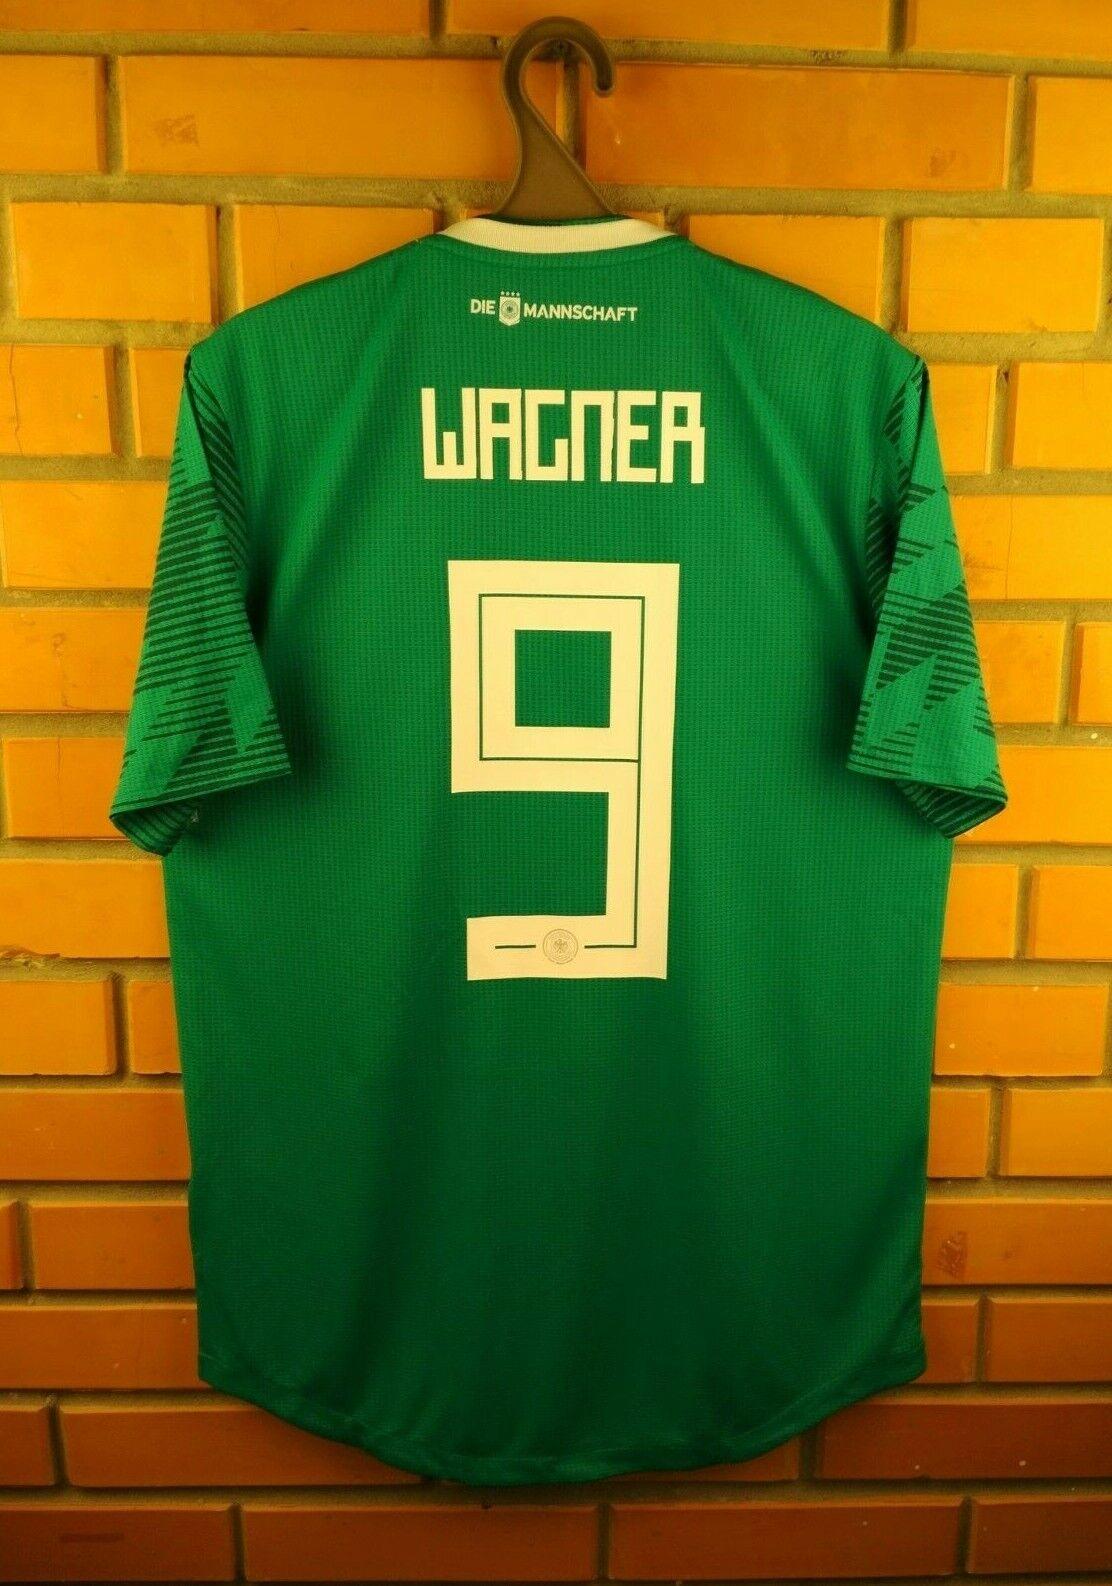 Wagner Germany authentic jersey medium 2019 shirt BR3143 soccer football Adidas